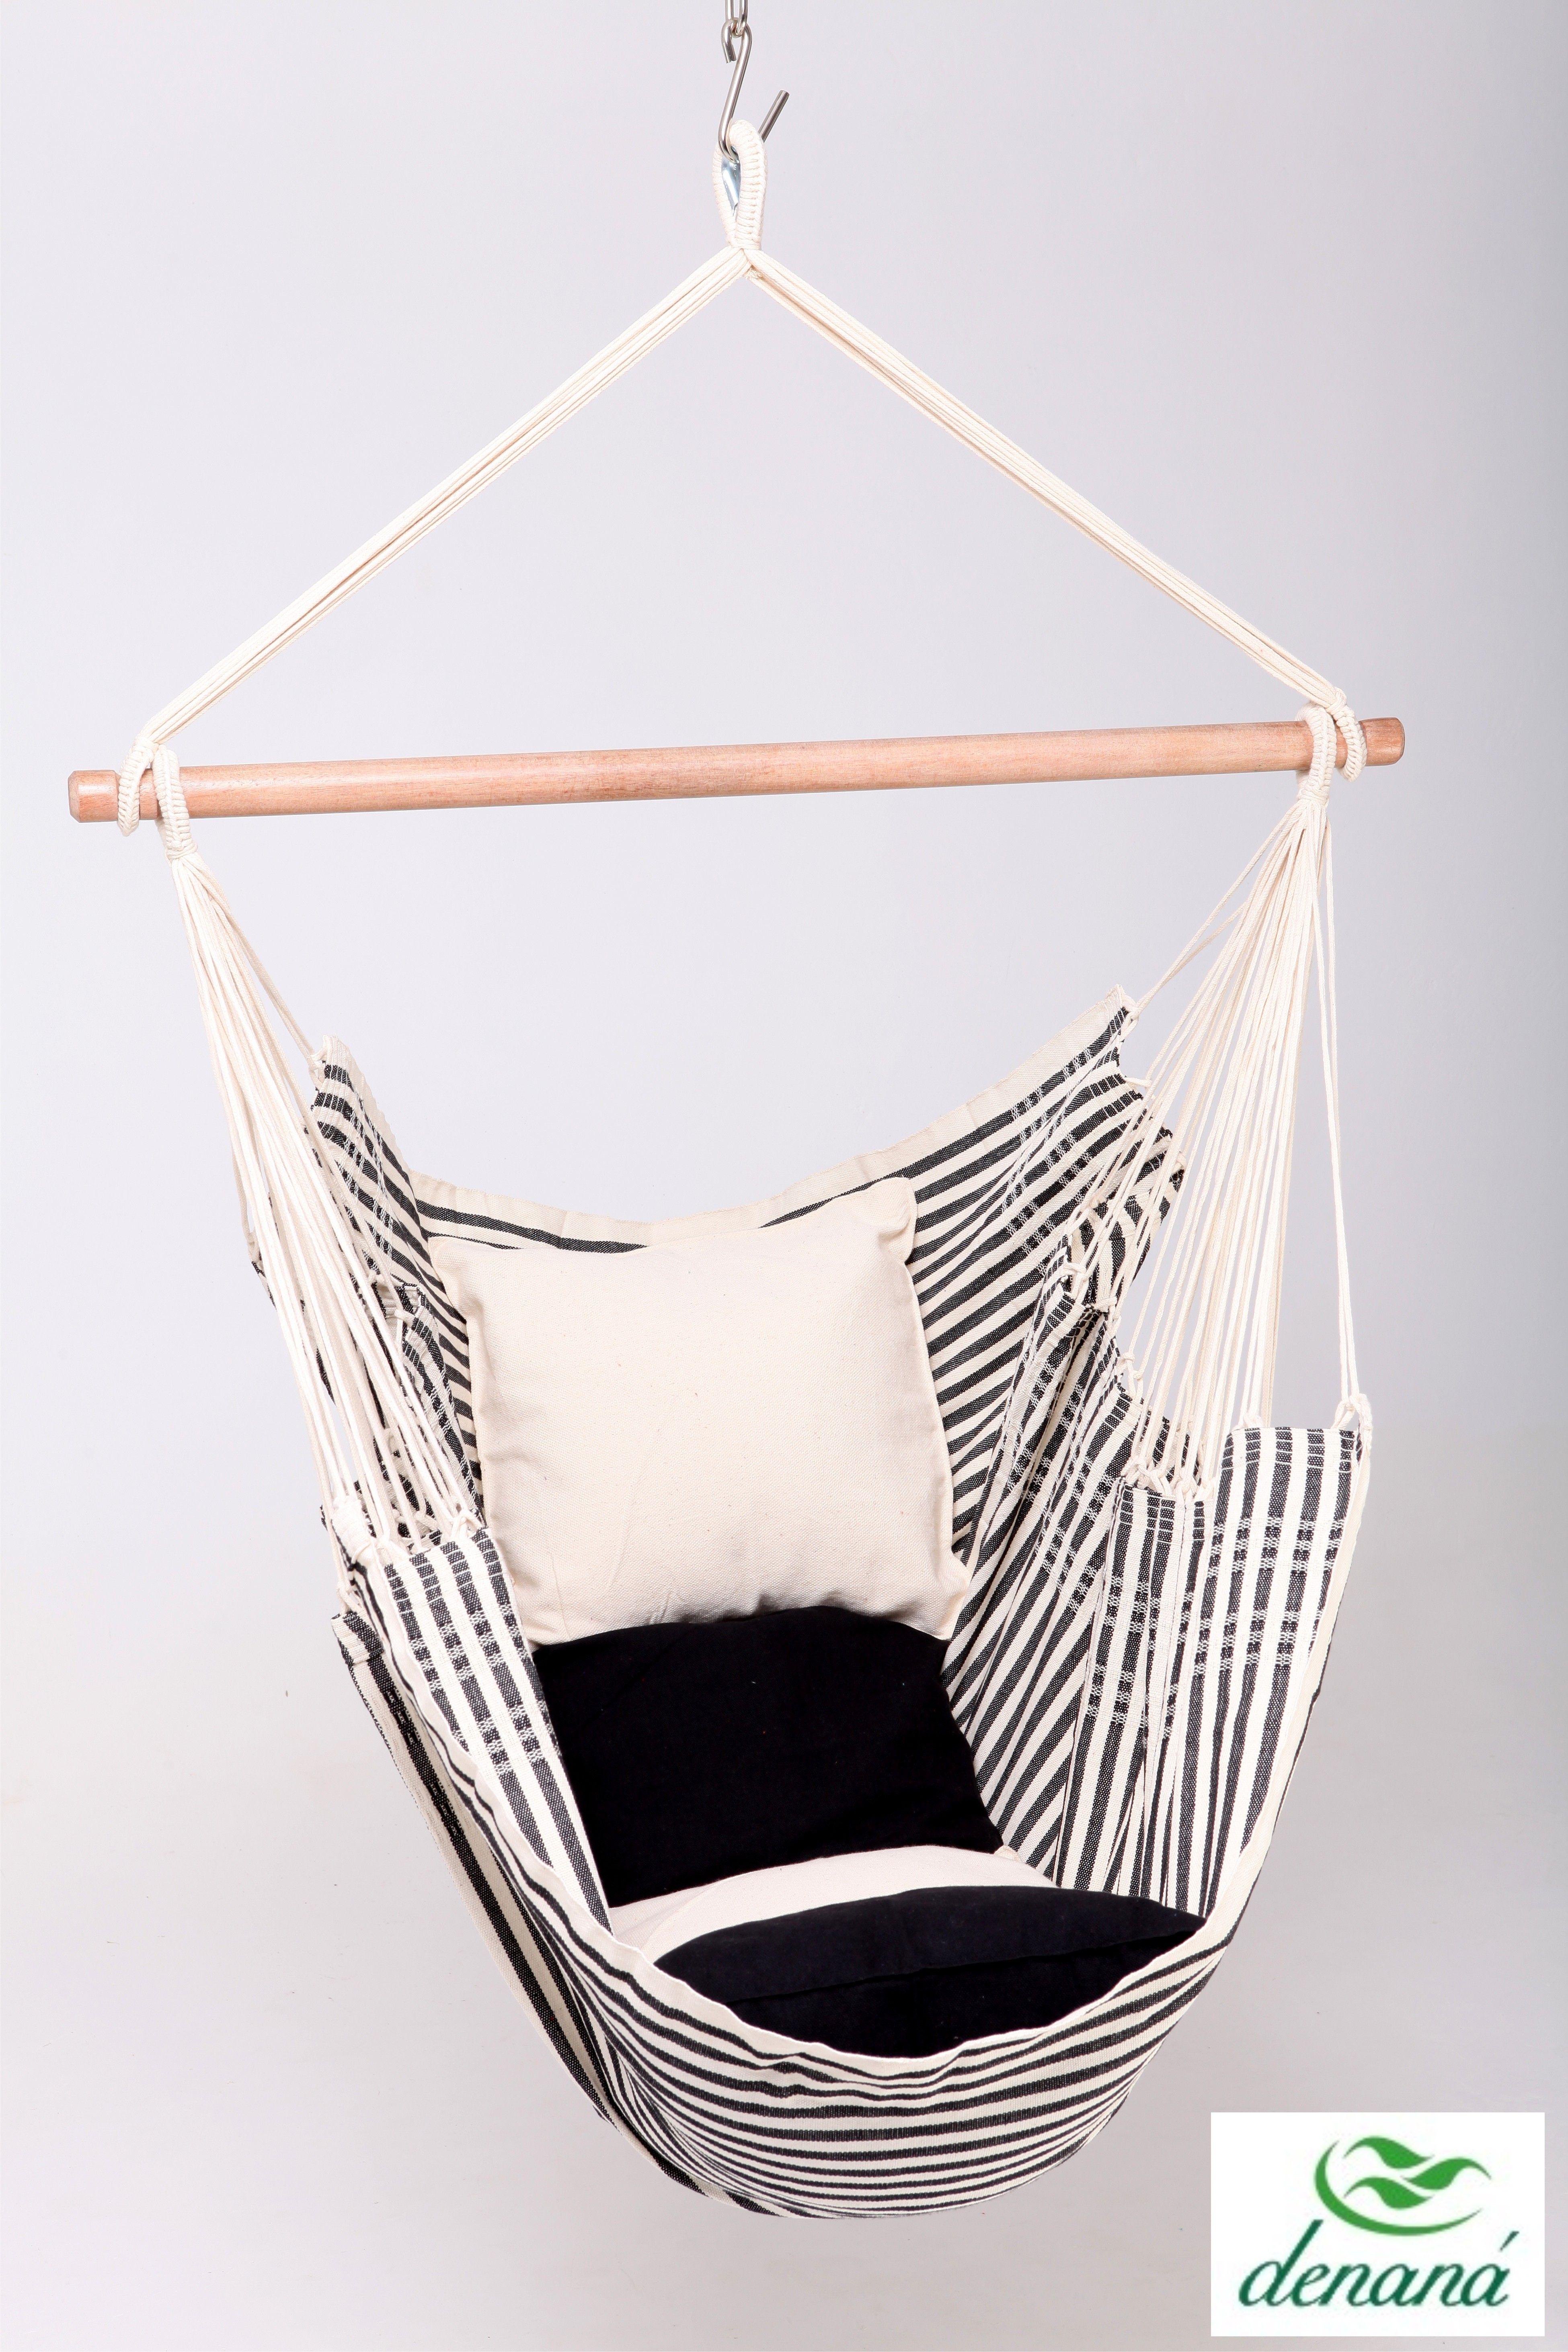 Denana Hamak Brazylijski Fotel Pretinho Hamaki Akcesoria Hotfox Hanging Chair Decor Modern